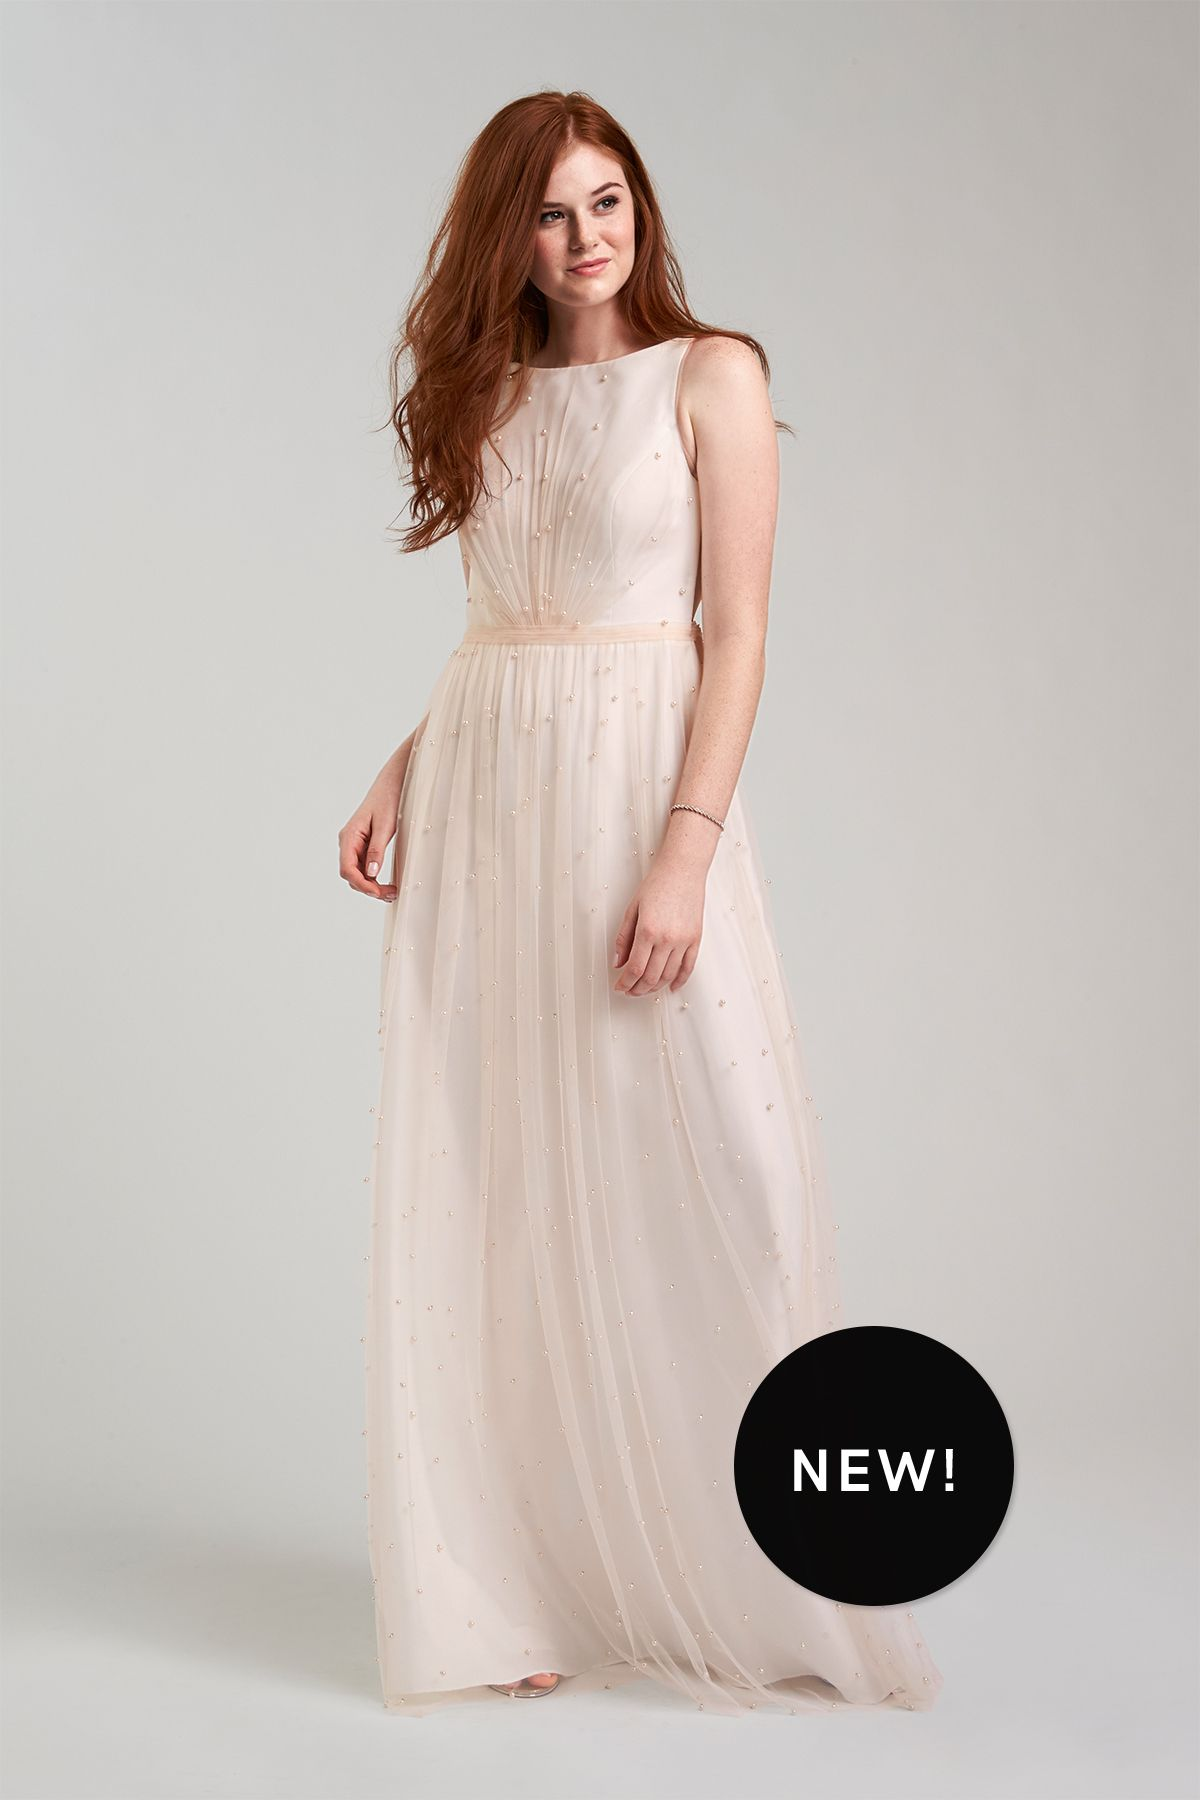 Champagne and ivory wedding dress  Bryn Bridesmaid Dress in Champagne Ivory  Weddingtype Things